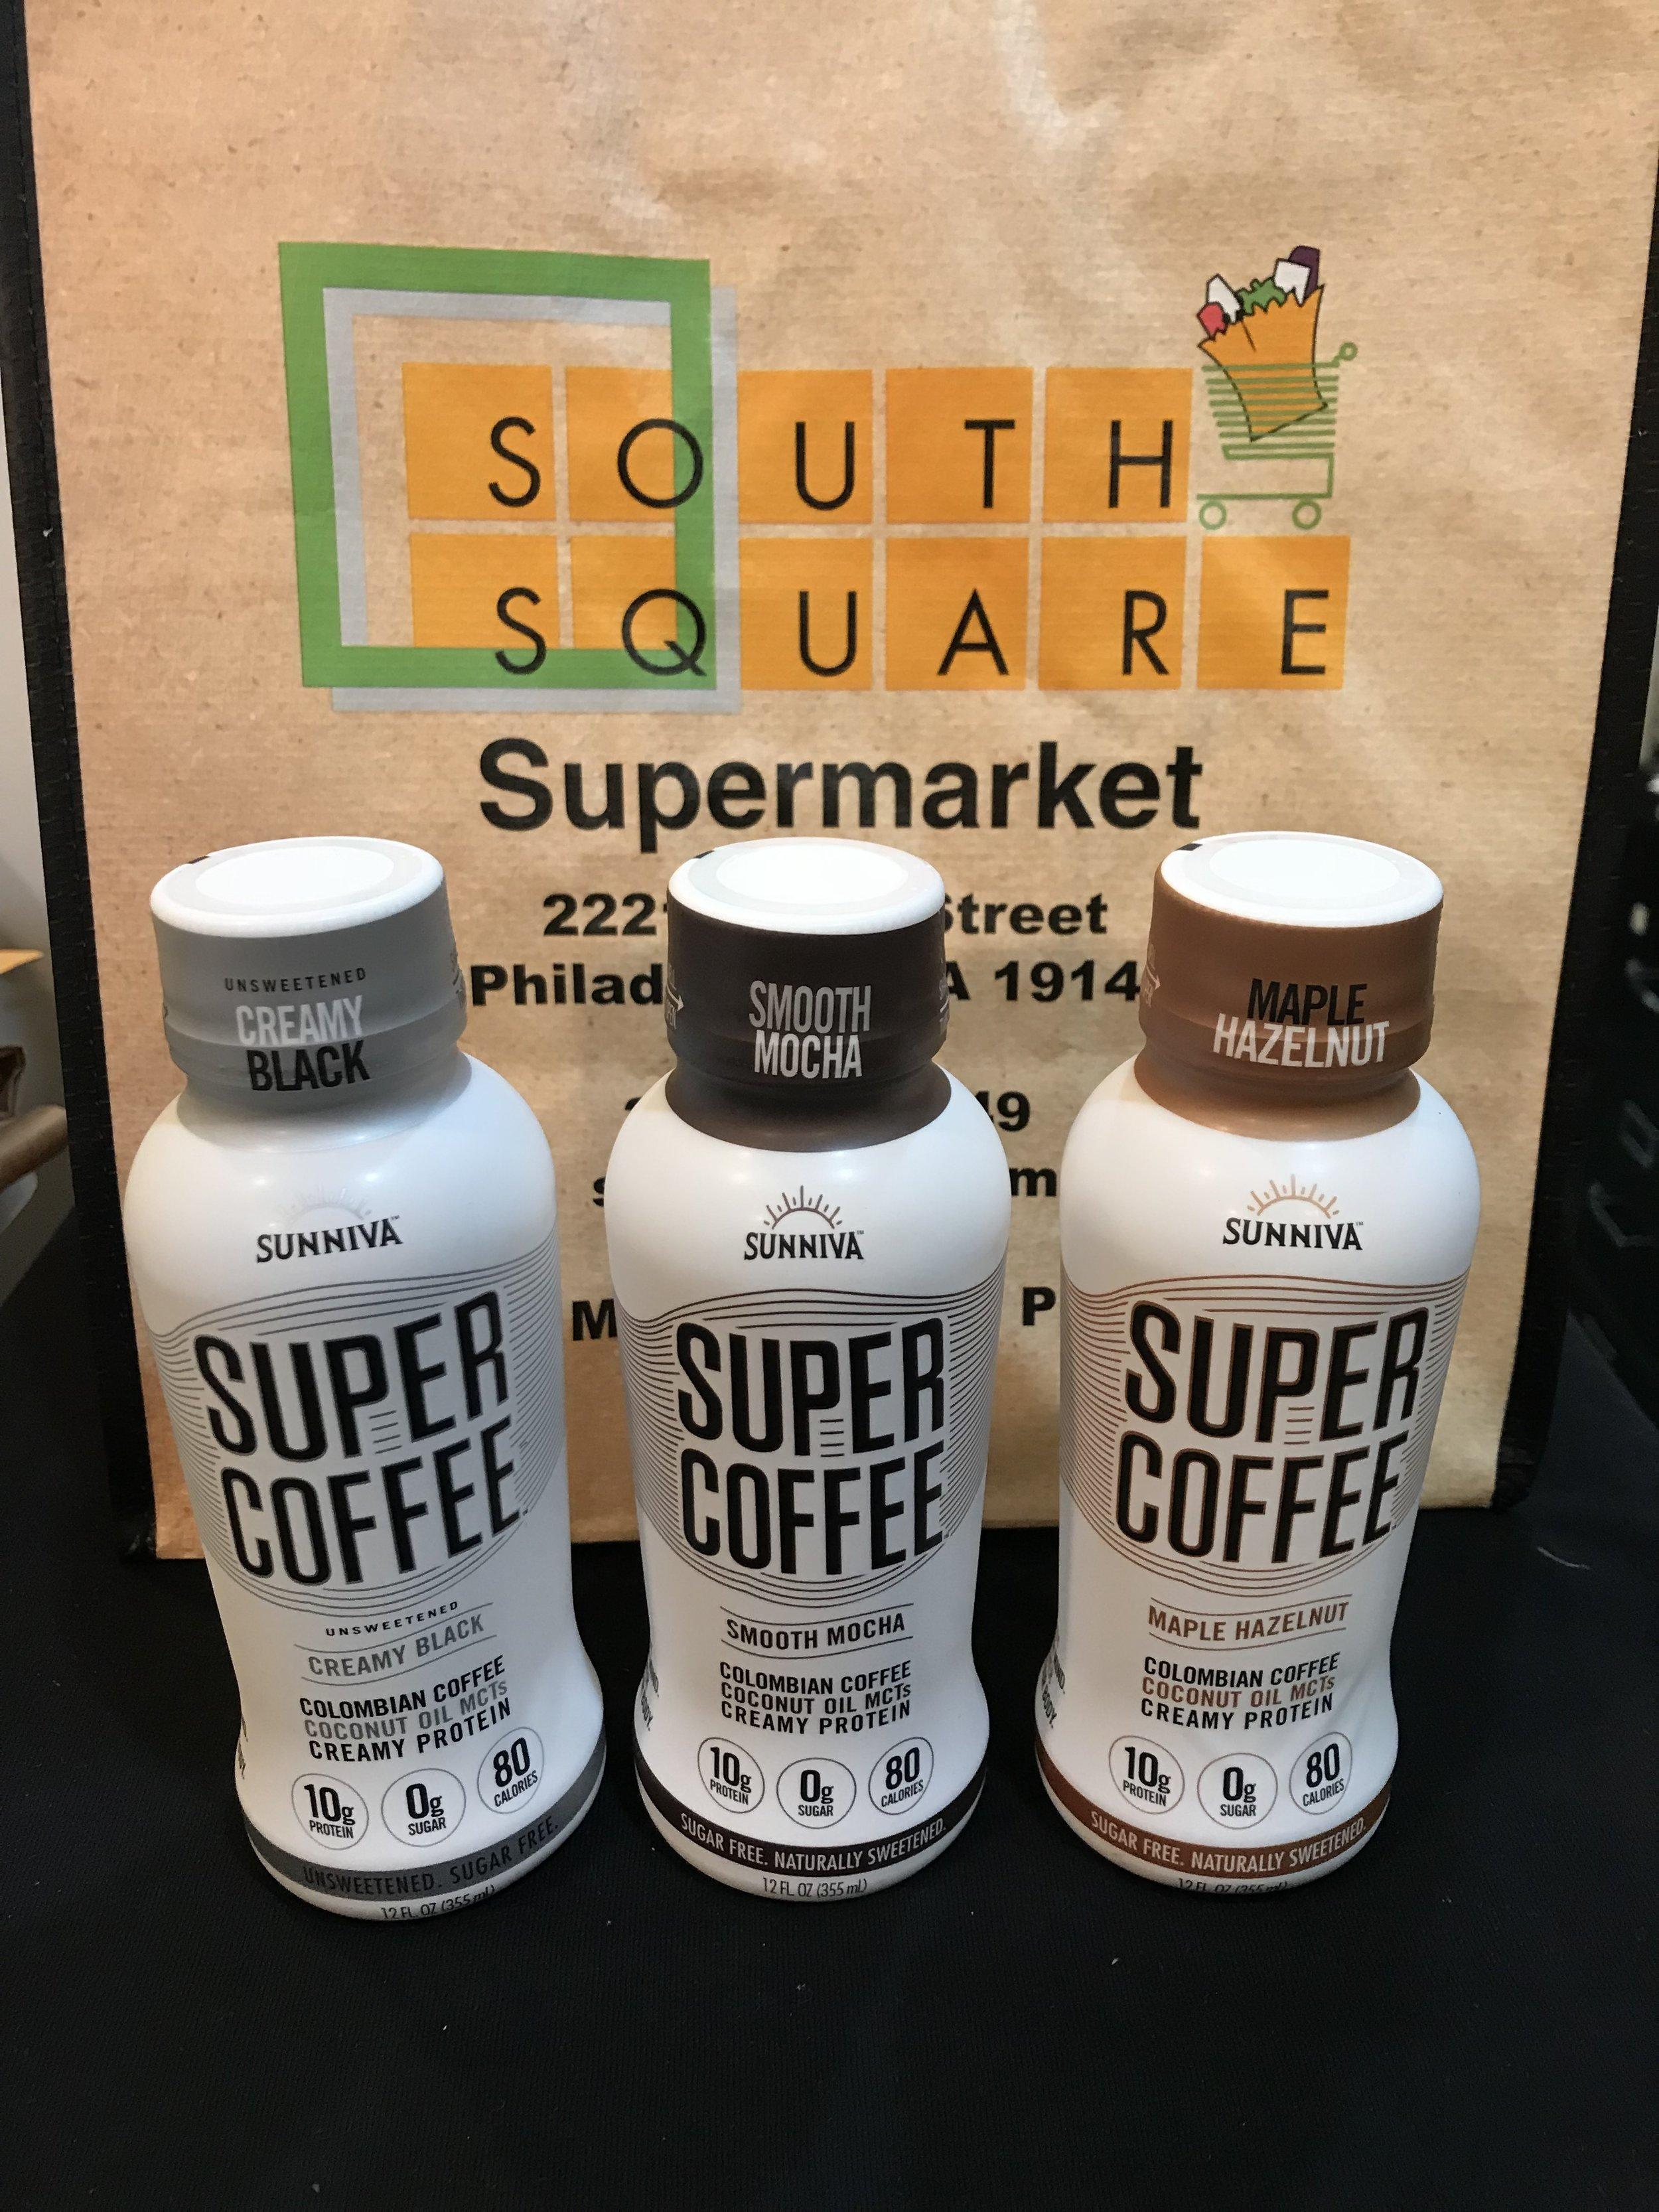 Sunniva Super Coffee